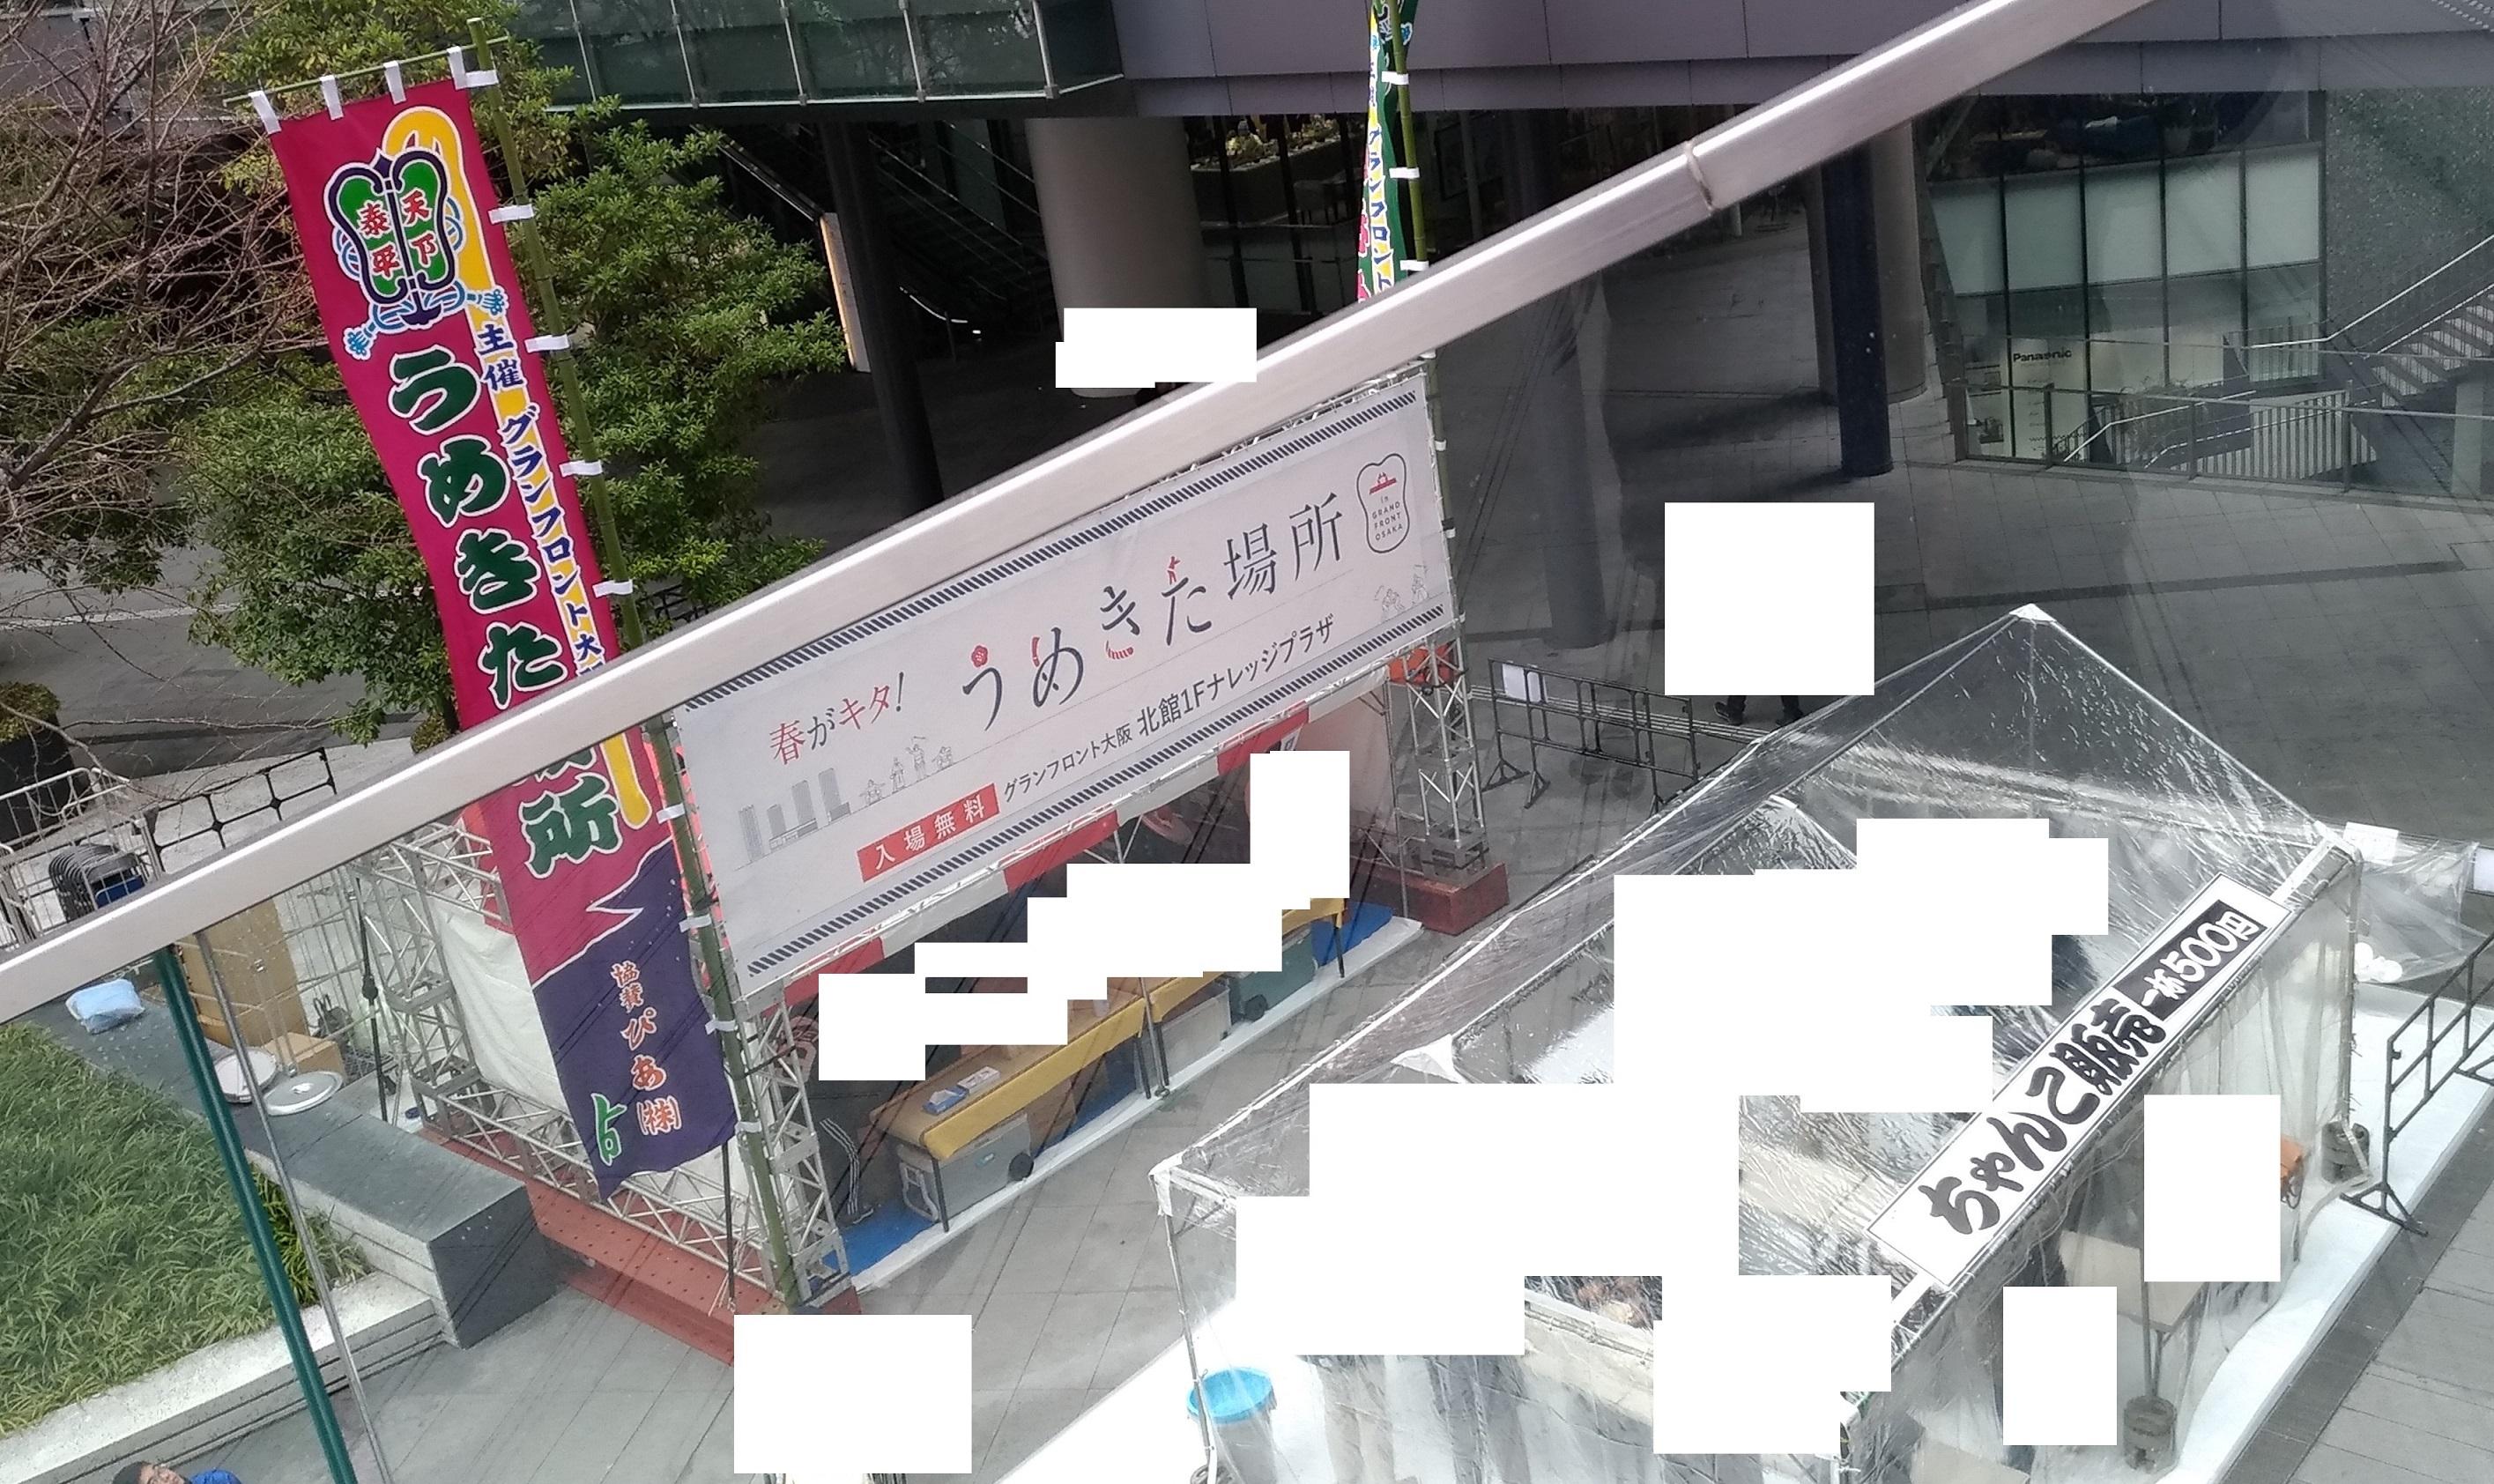 osaka_umeda_granfrontosaka_sumou.jpg